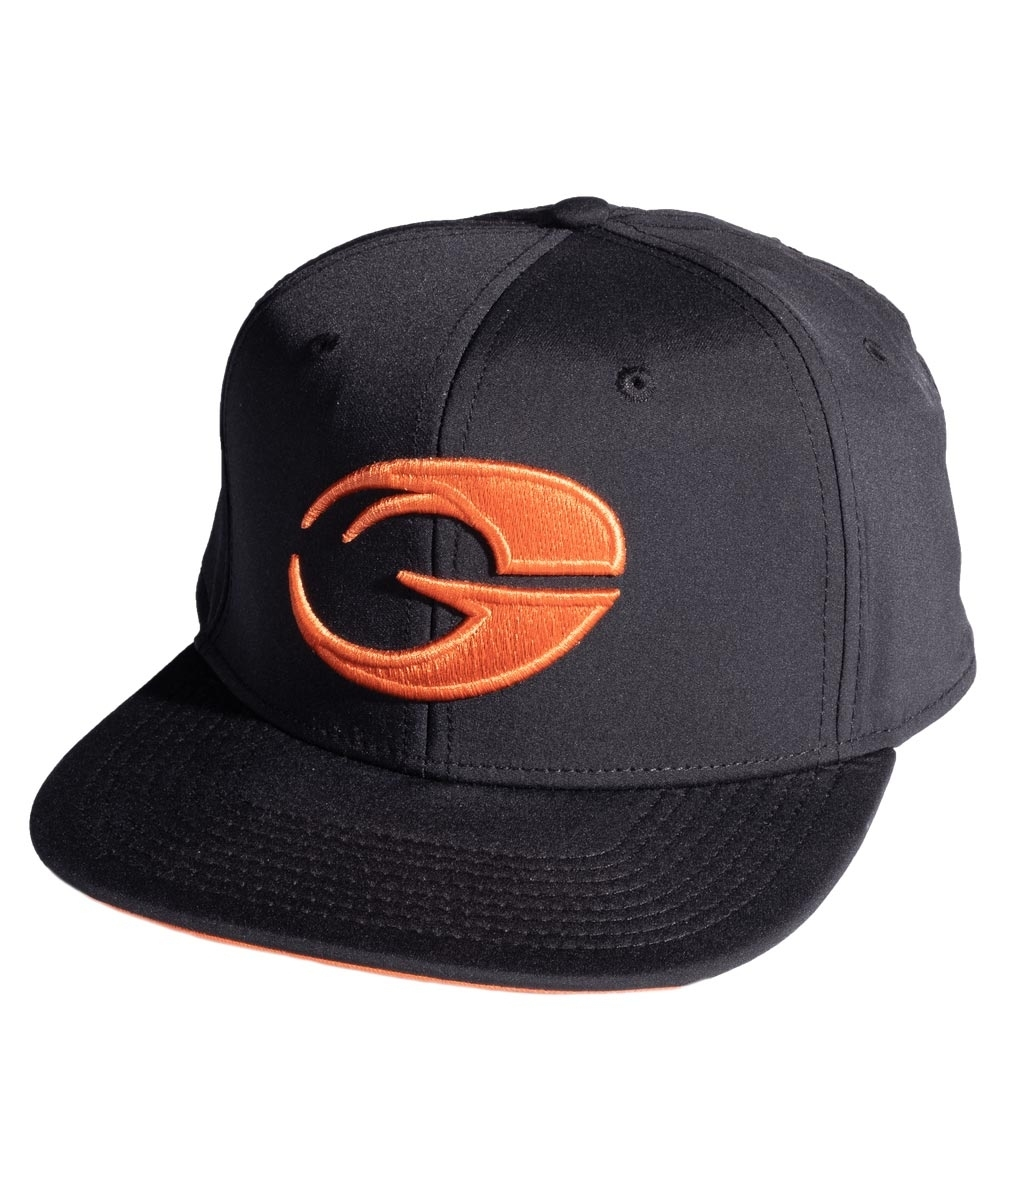 GASP No Compromise Şapka Siyah